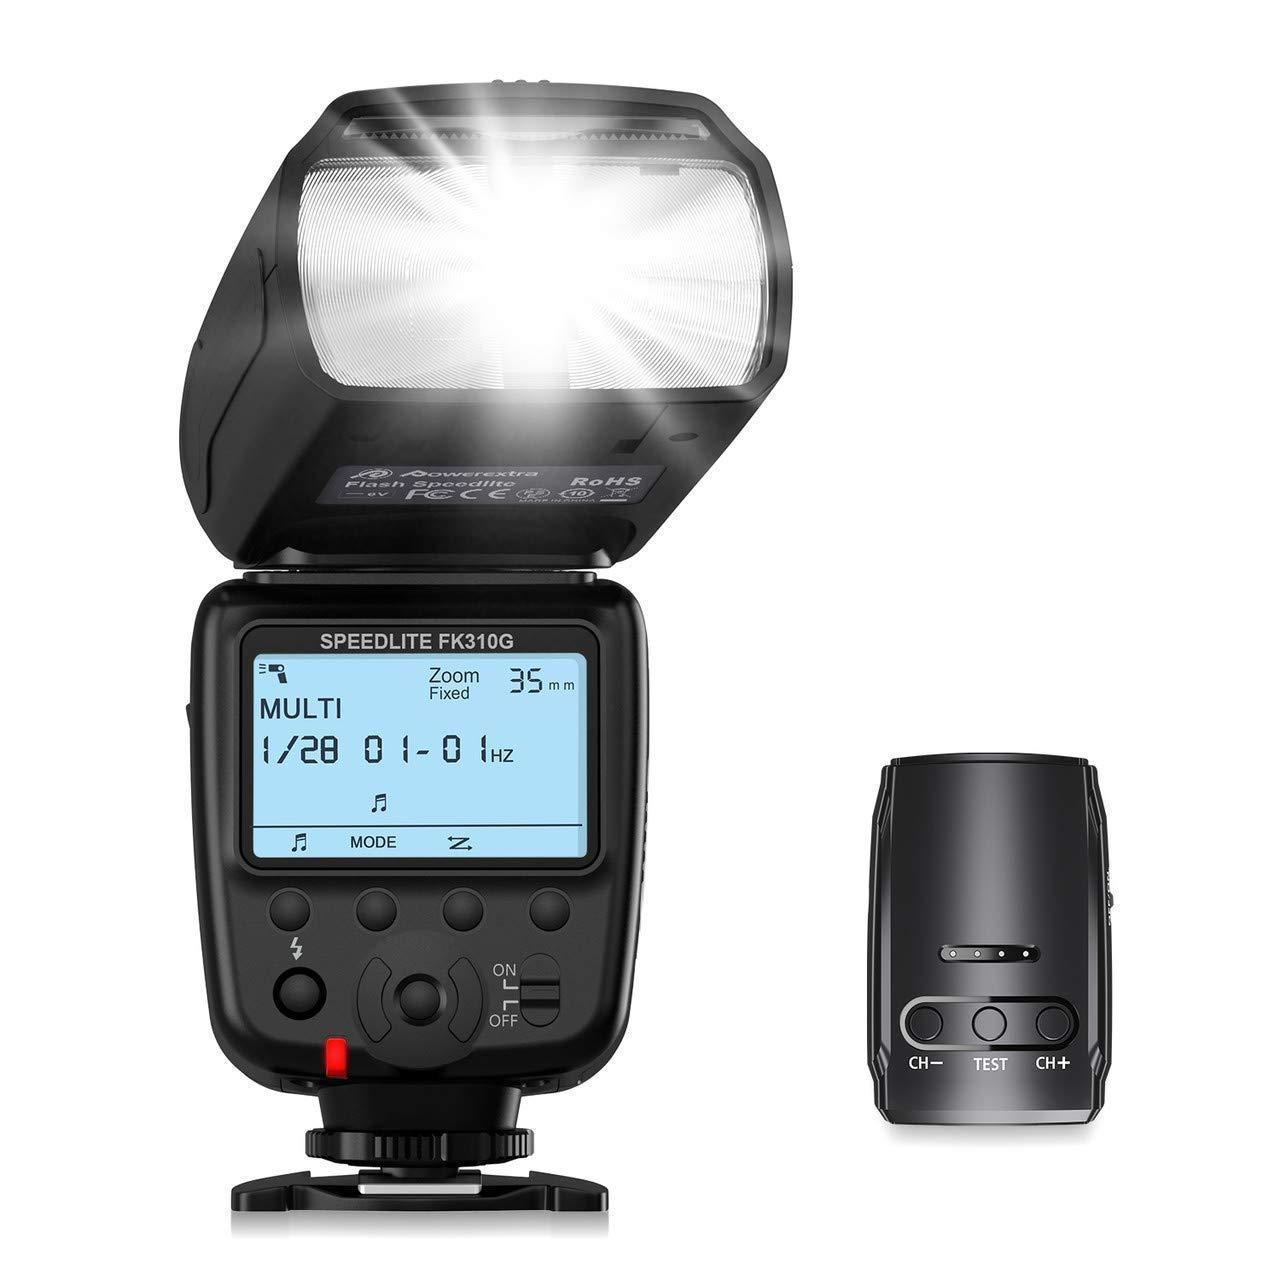 Powerextra LCD Display Flash Speedlite, 2.4G Wireless Flash Trigger Transmitter Kit for Canon Nikon Pentax Panasonic Olympus and Sony DSLR Camera, Digital Cameras with Standard Hot Shoe